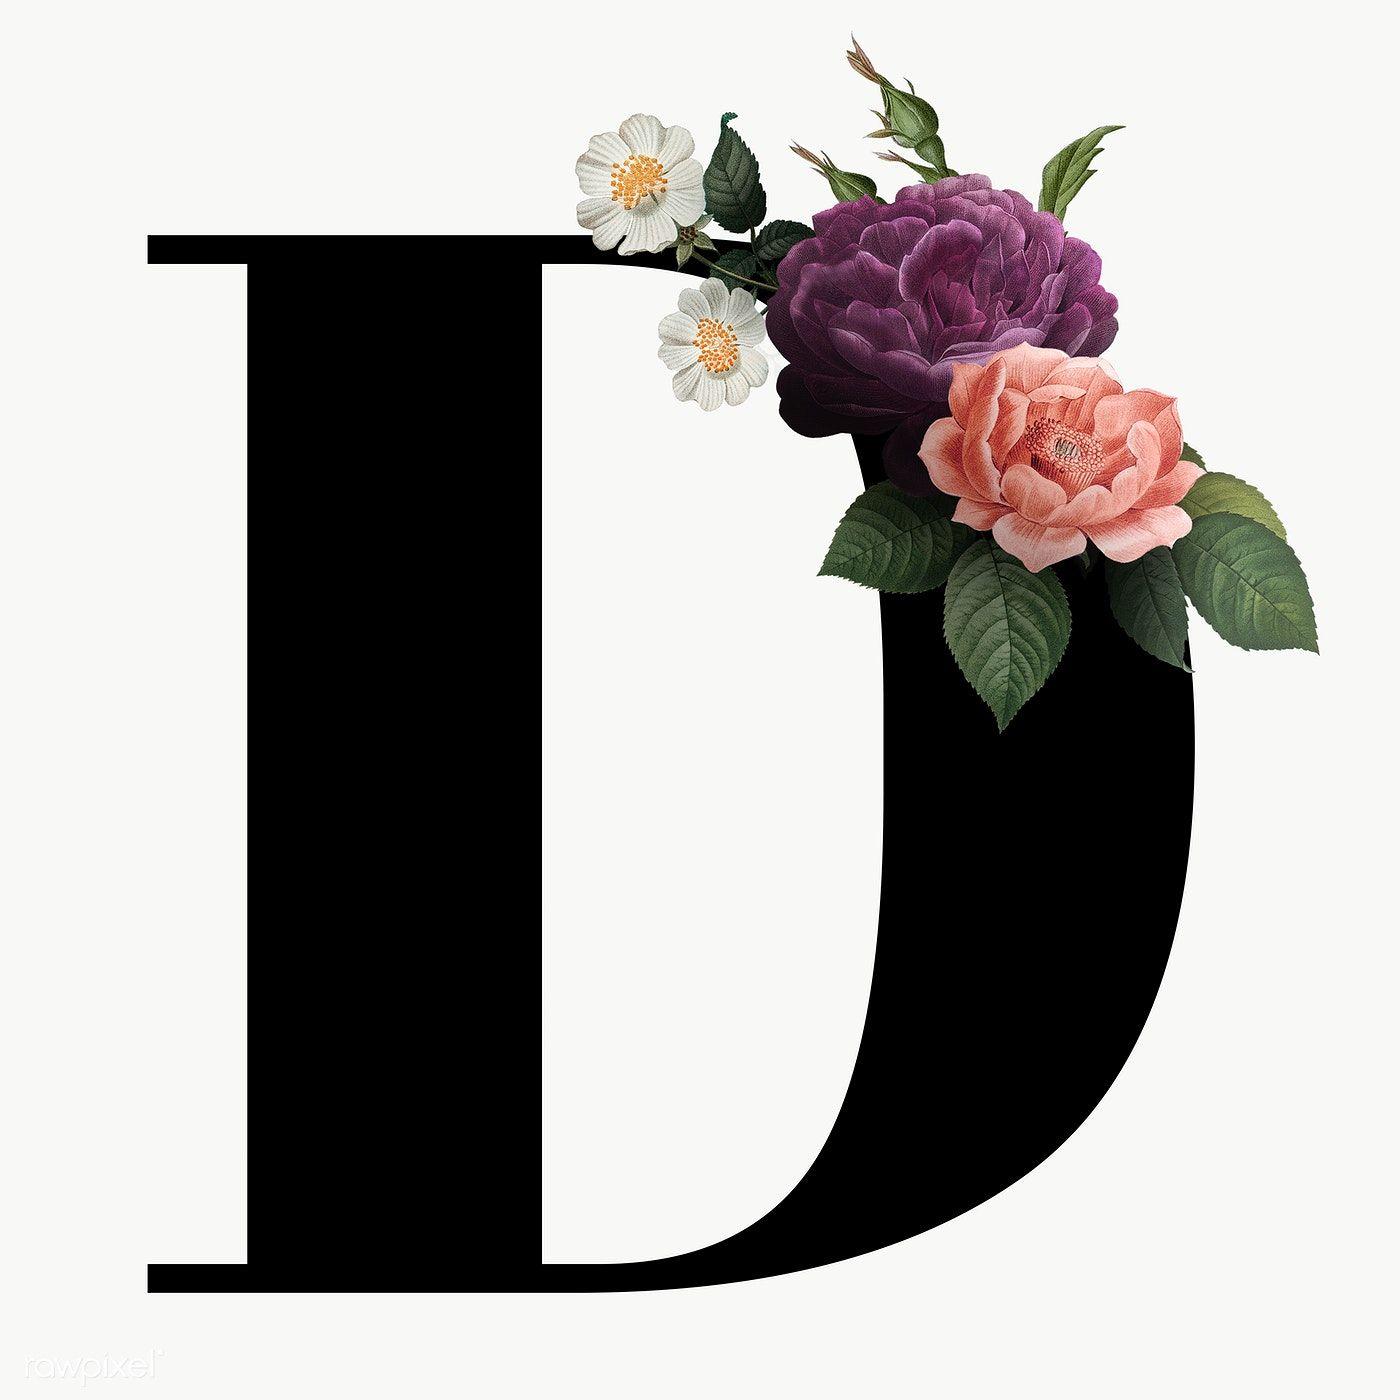 Classic And Elegant Floral Alphabet Font Letter D Transparent Png Free Image By Rawpixel Com Lettering Alphabet Fonts Fonts Alphabet Lettering Fonts